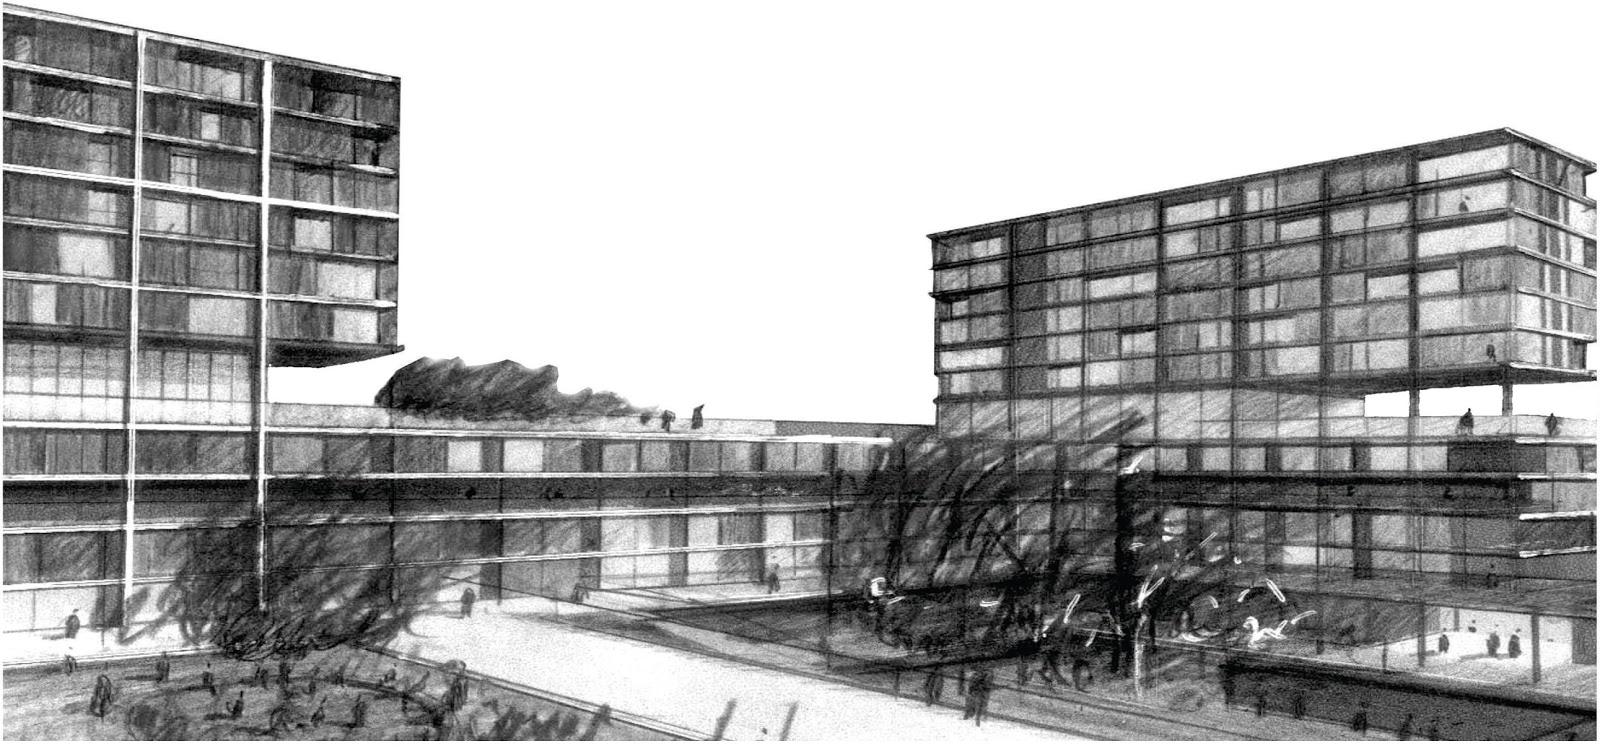 Servicios de arquitectura plan de renovaci n urbana for Equipamiento urbano arquitectura pdf